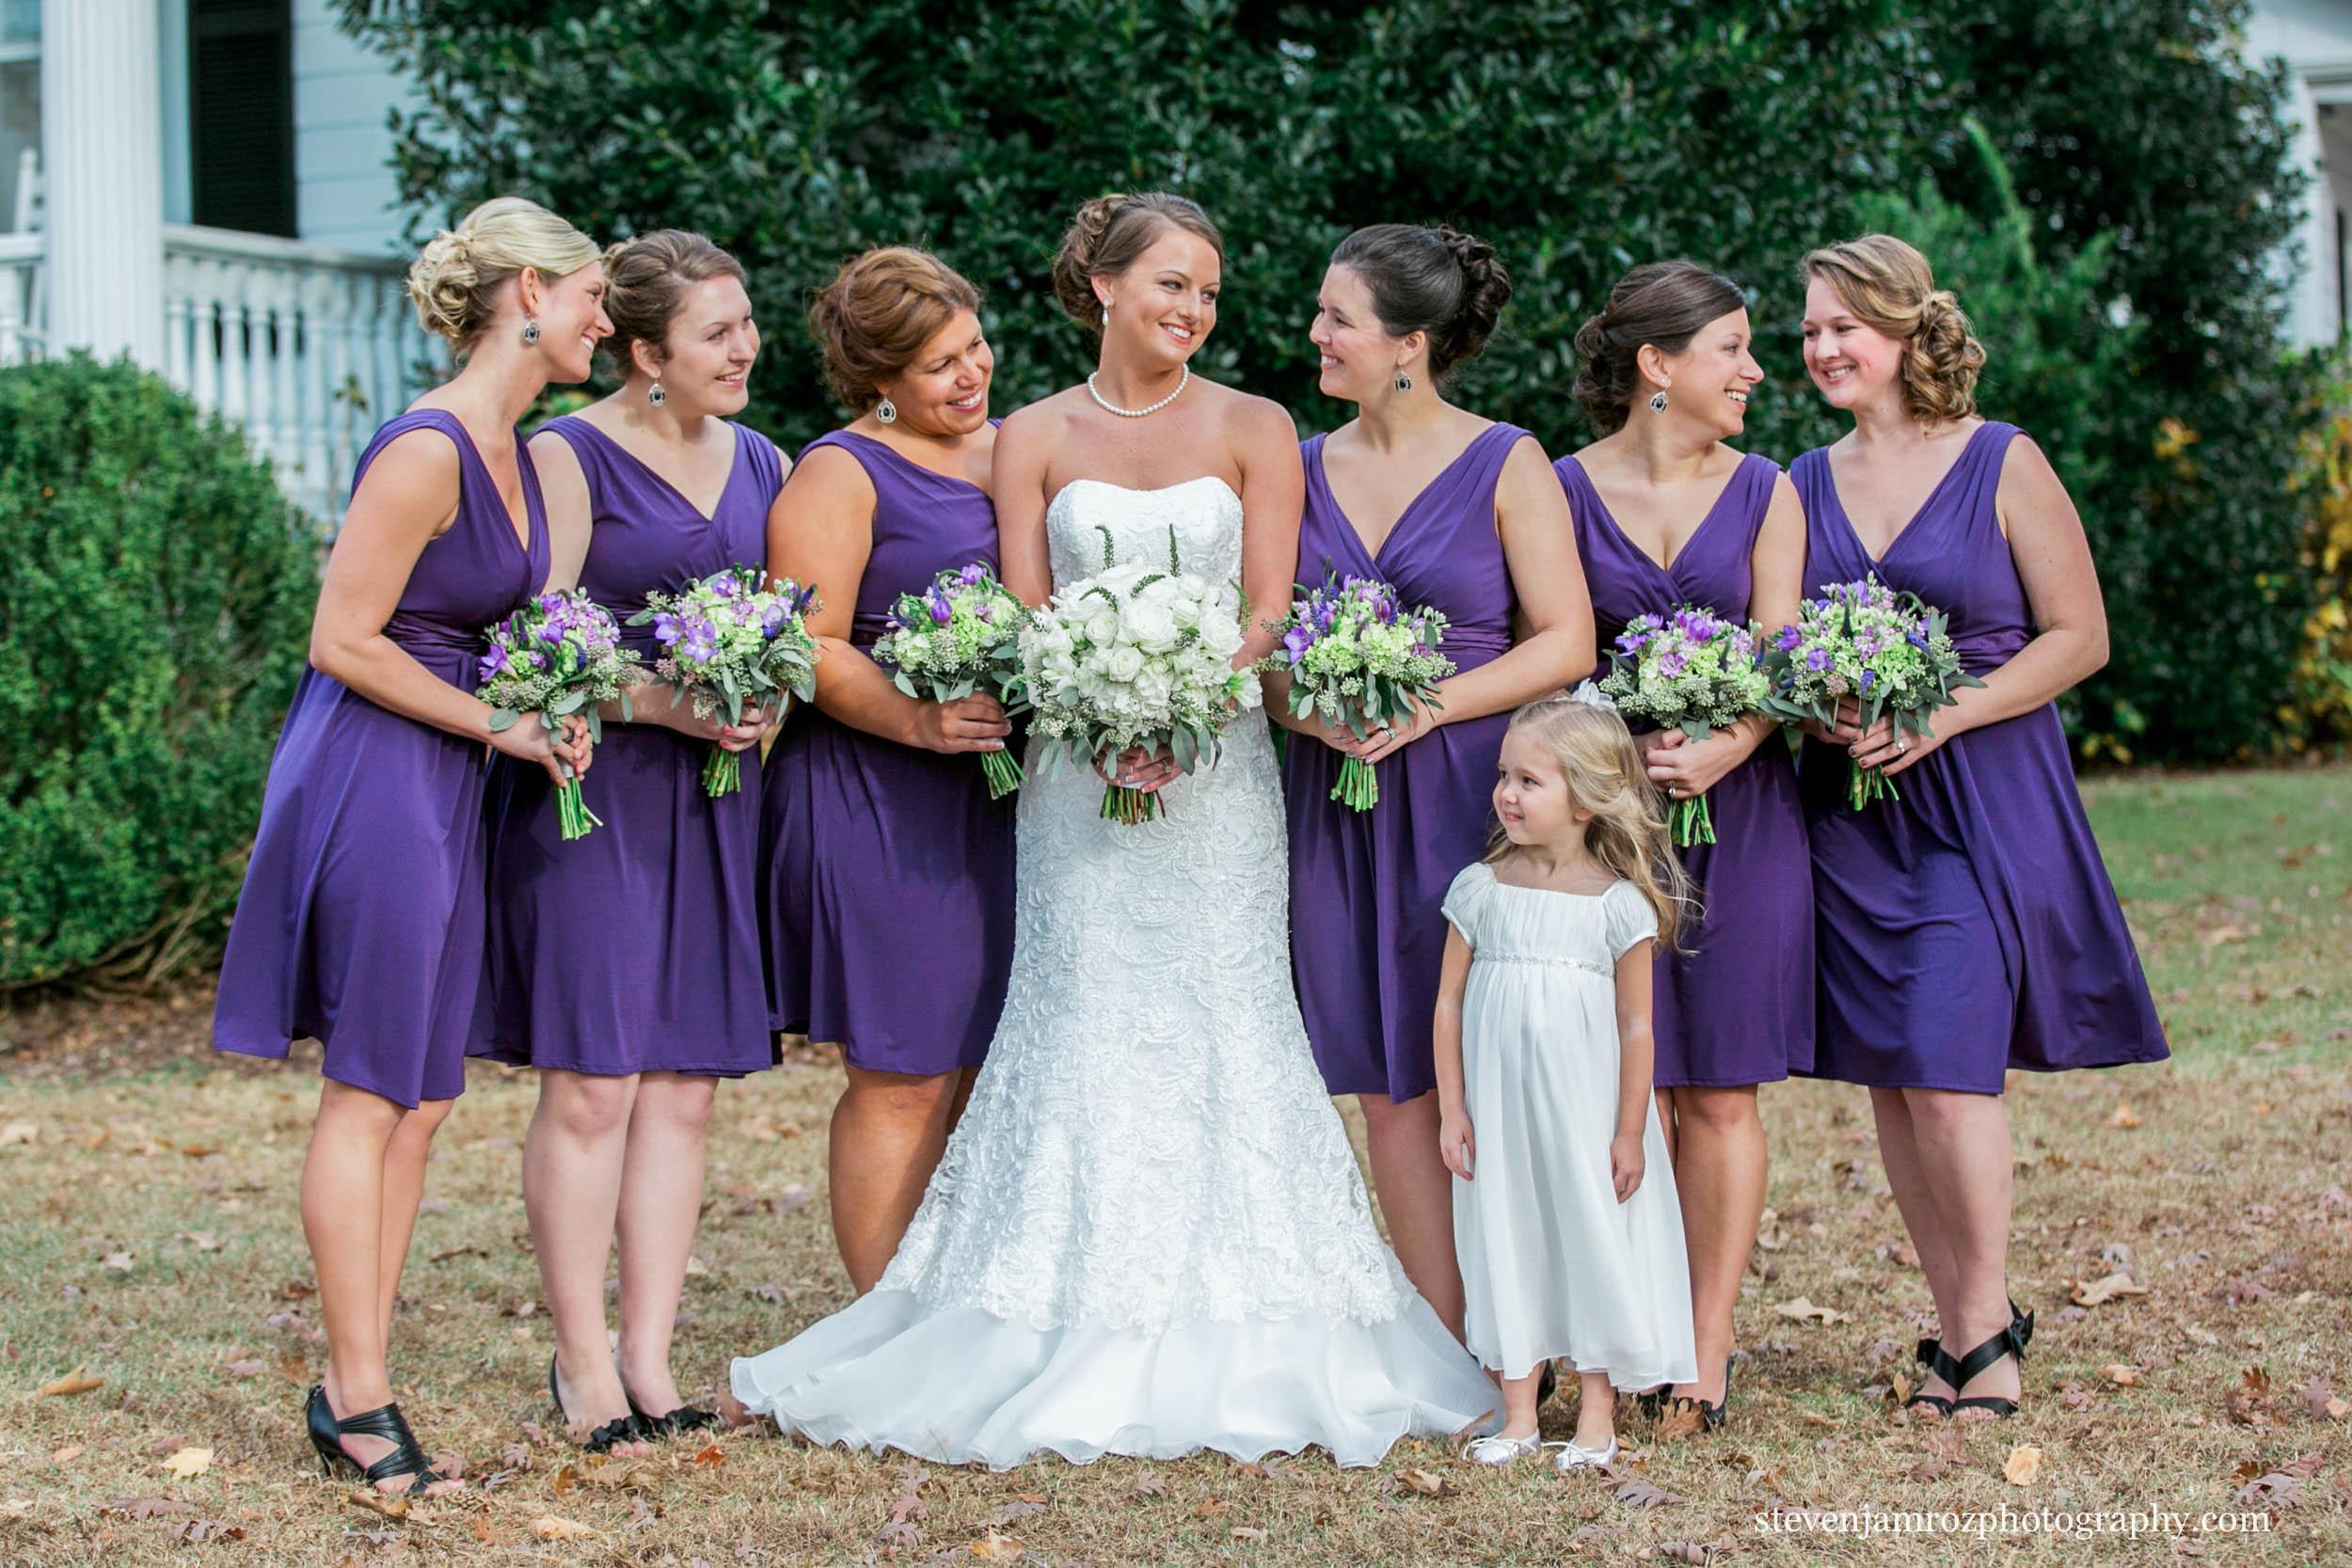 photographers-louisburg-hudson-manor-bridesmaids-steven-jamroz-photography-0379.jpg